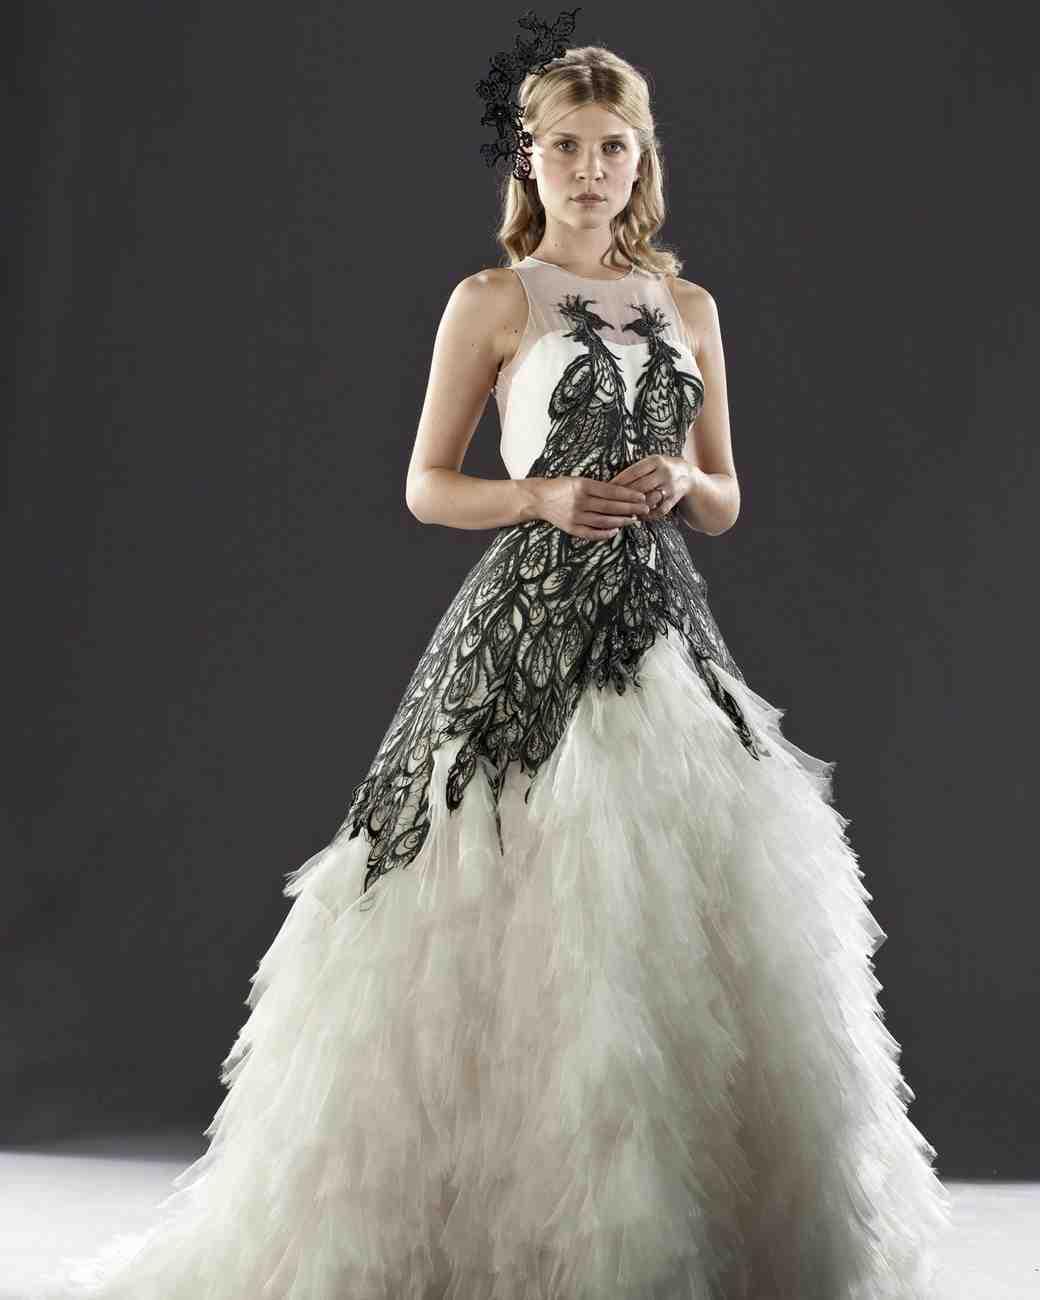 movie-wedding-dresses-harry-potter-clemence-poesy-0316.jpg